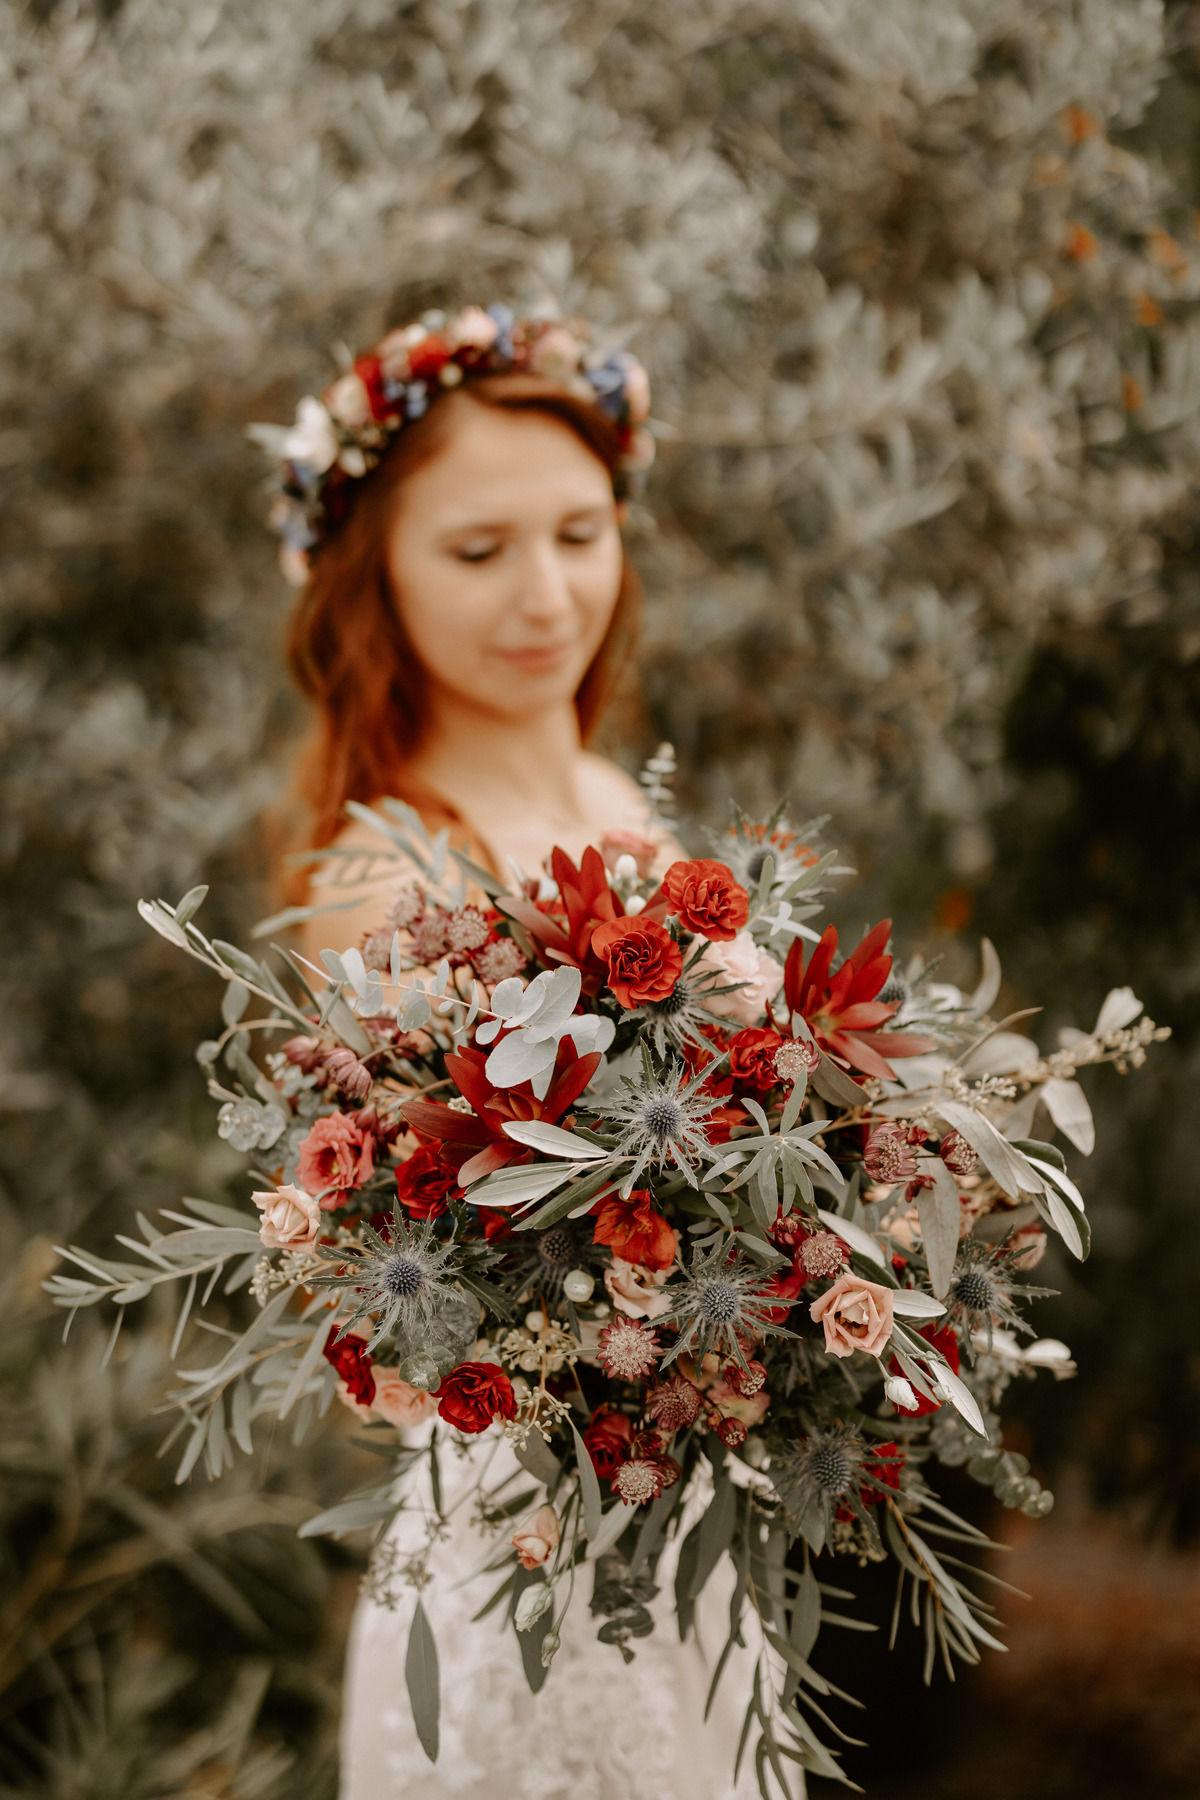 Wildflower_TabeaundUrs_-1